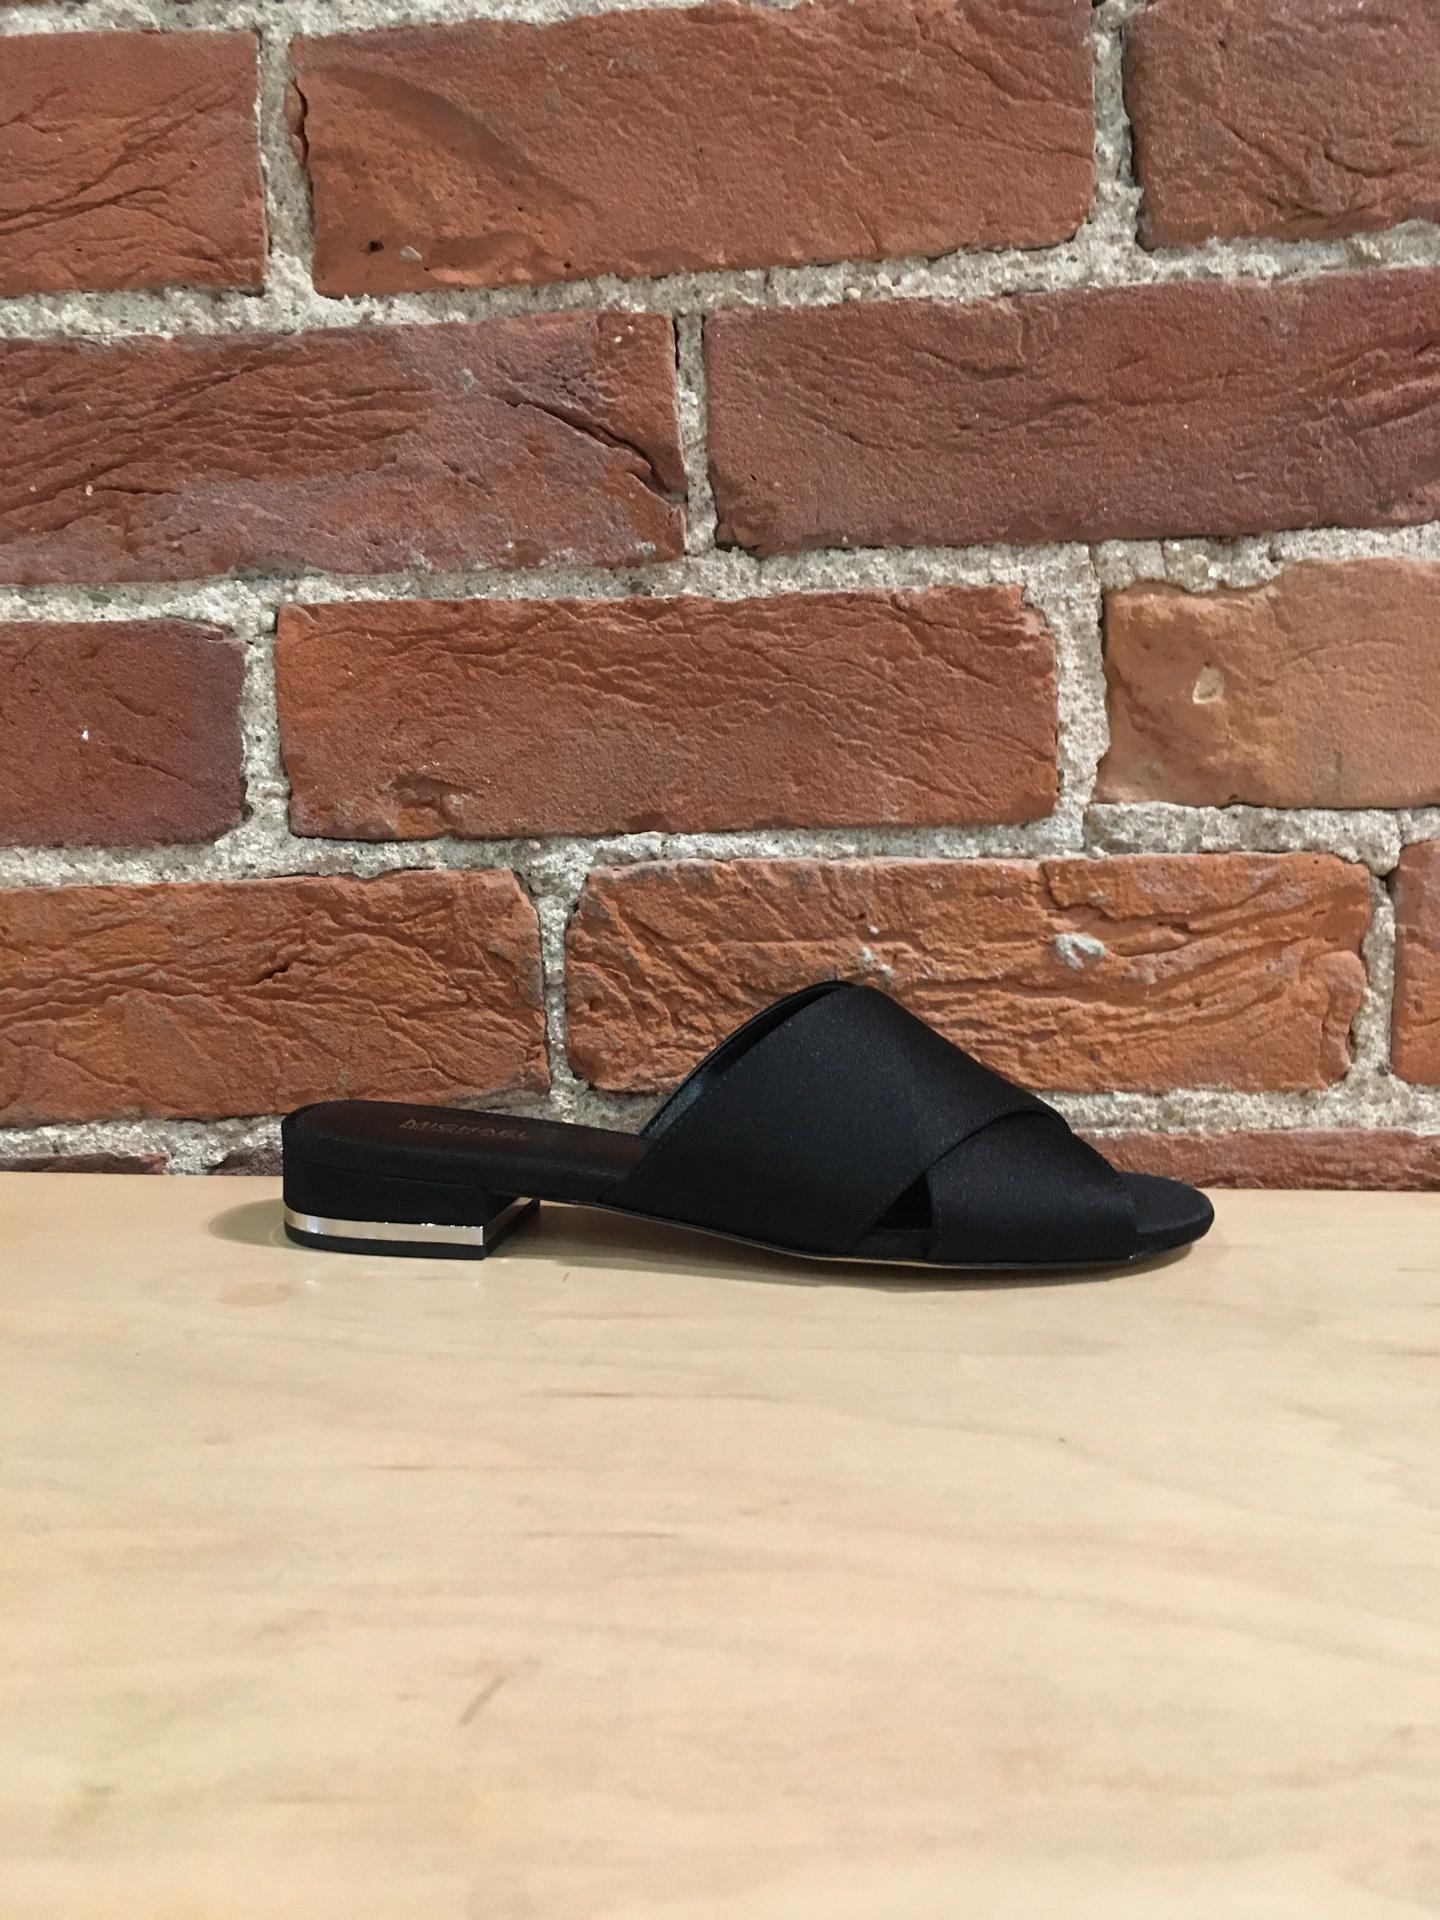 MICHAEL KORS - SHELLY FLAT SANDAL IN BLACK